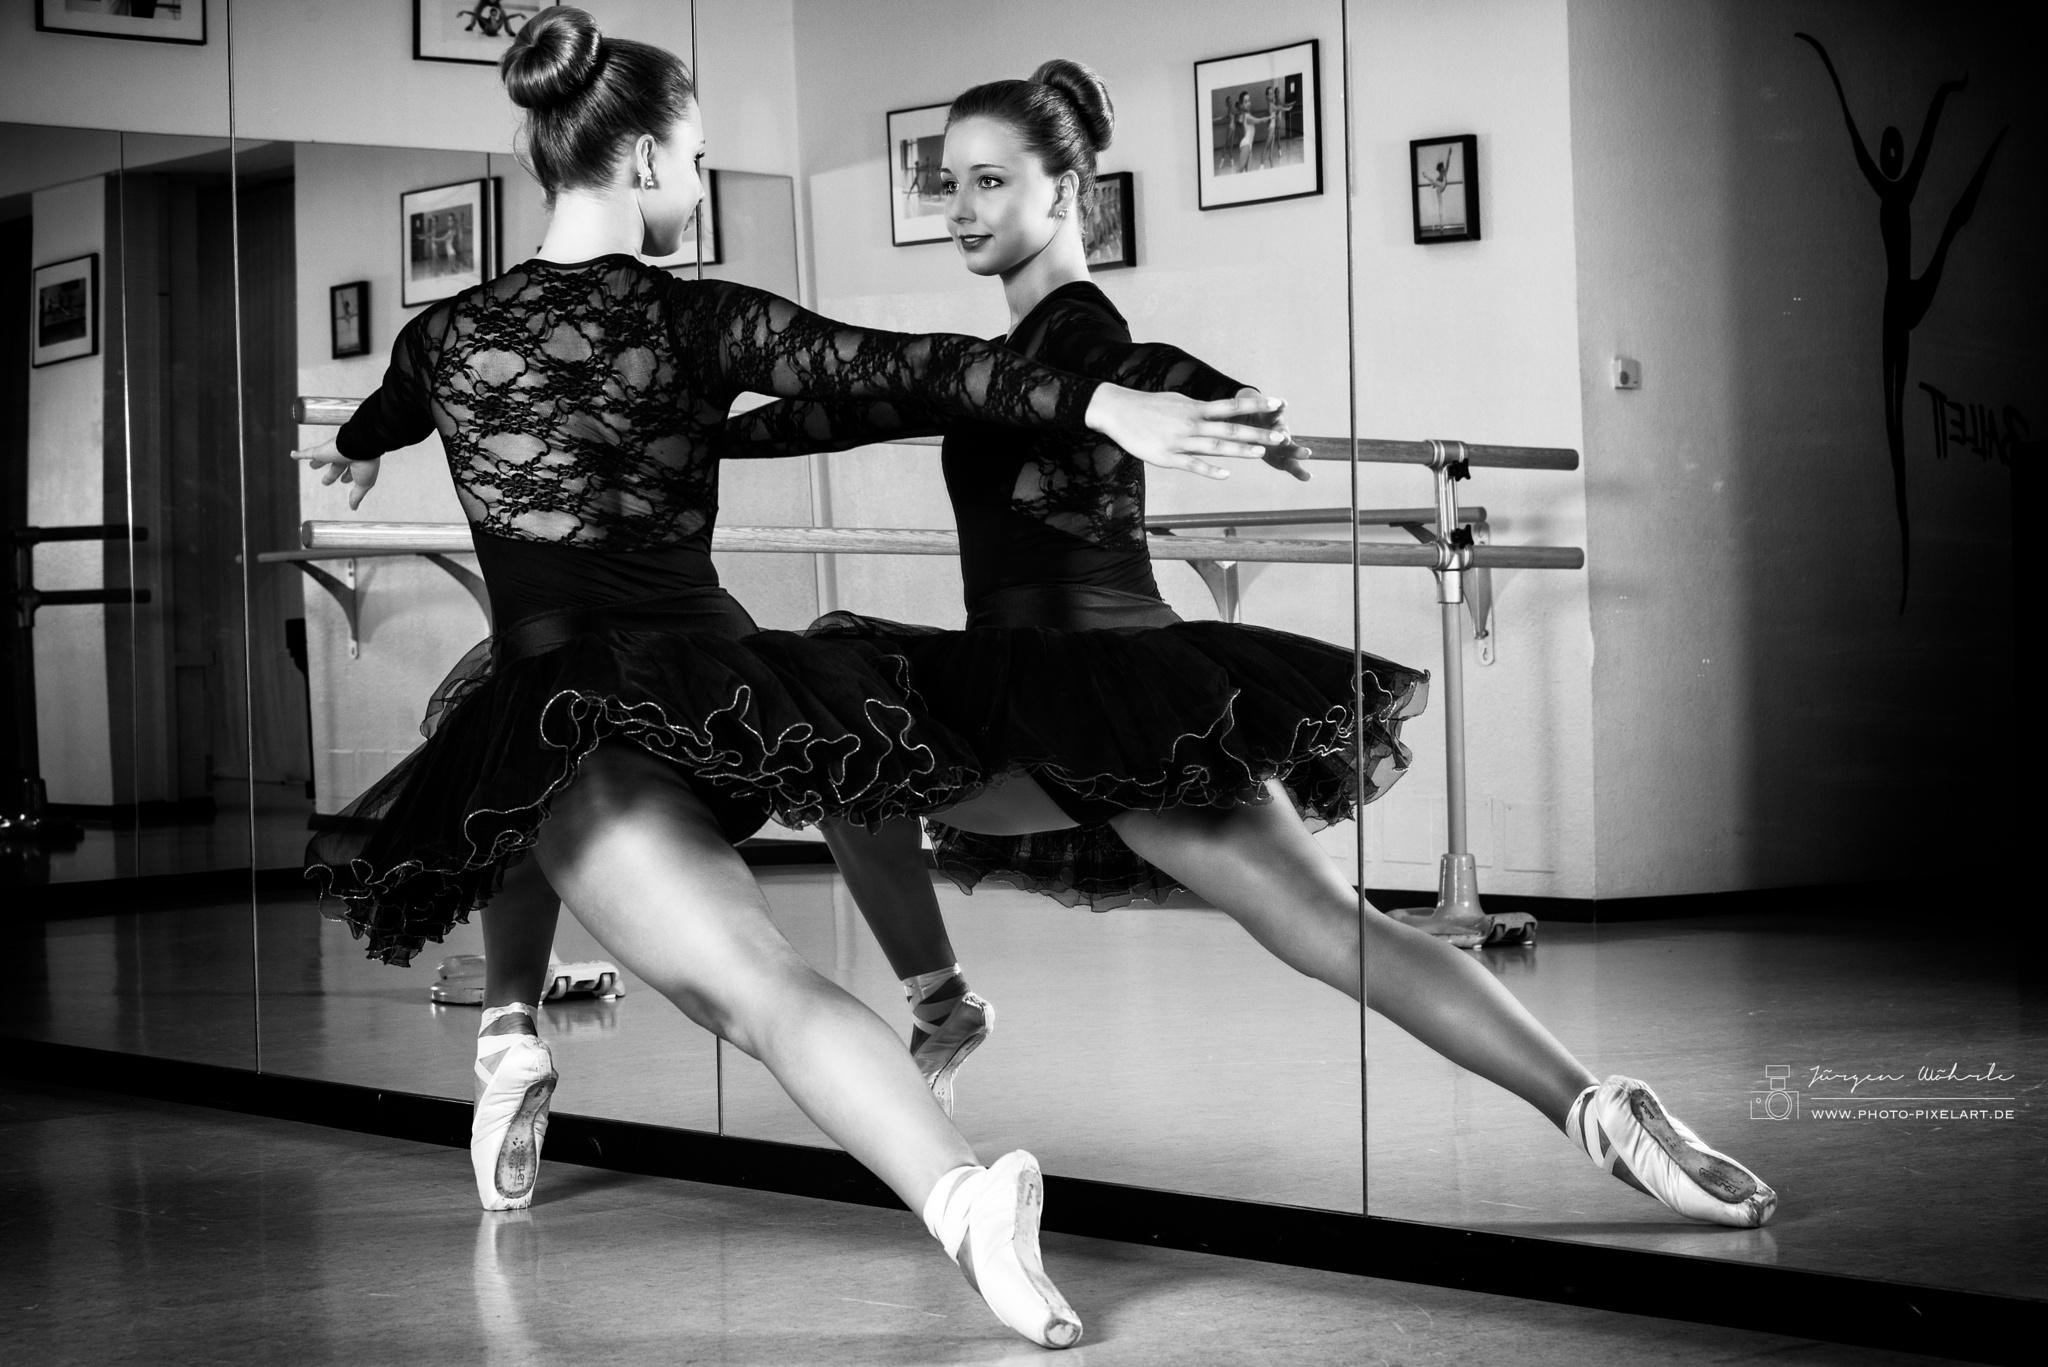 Ballett by Jürgen Wöhrle by Photo-Pixelart